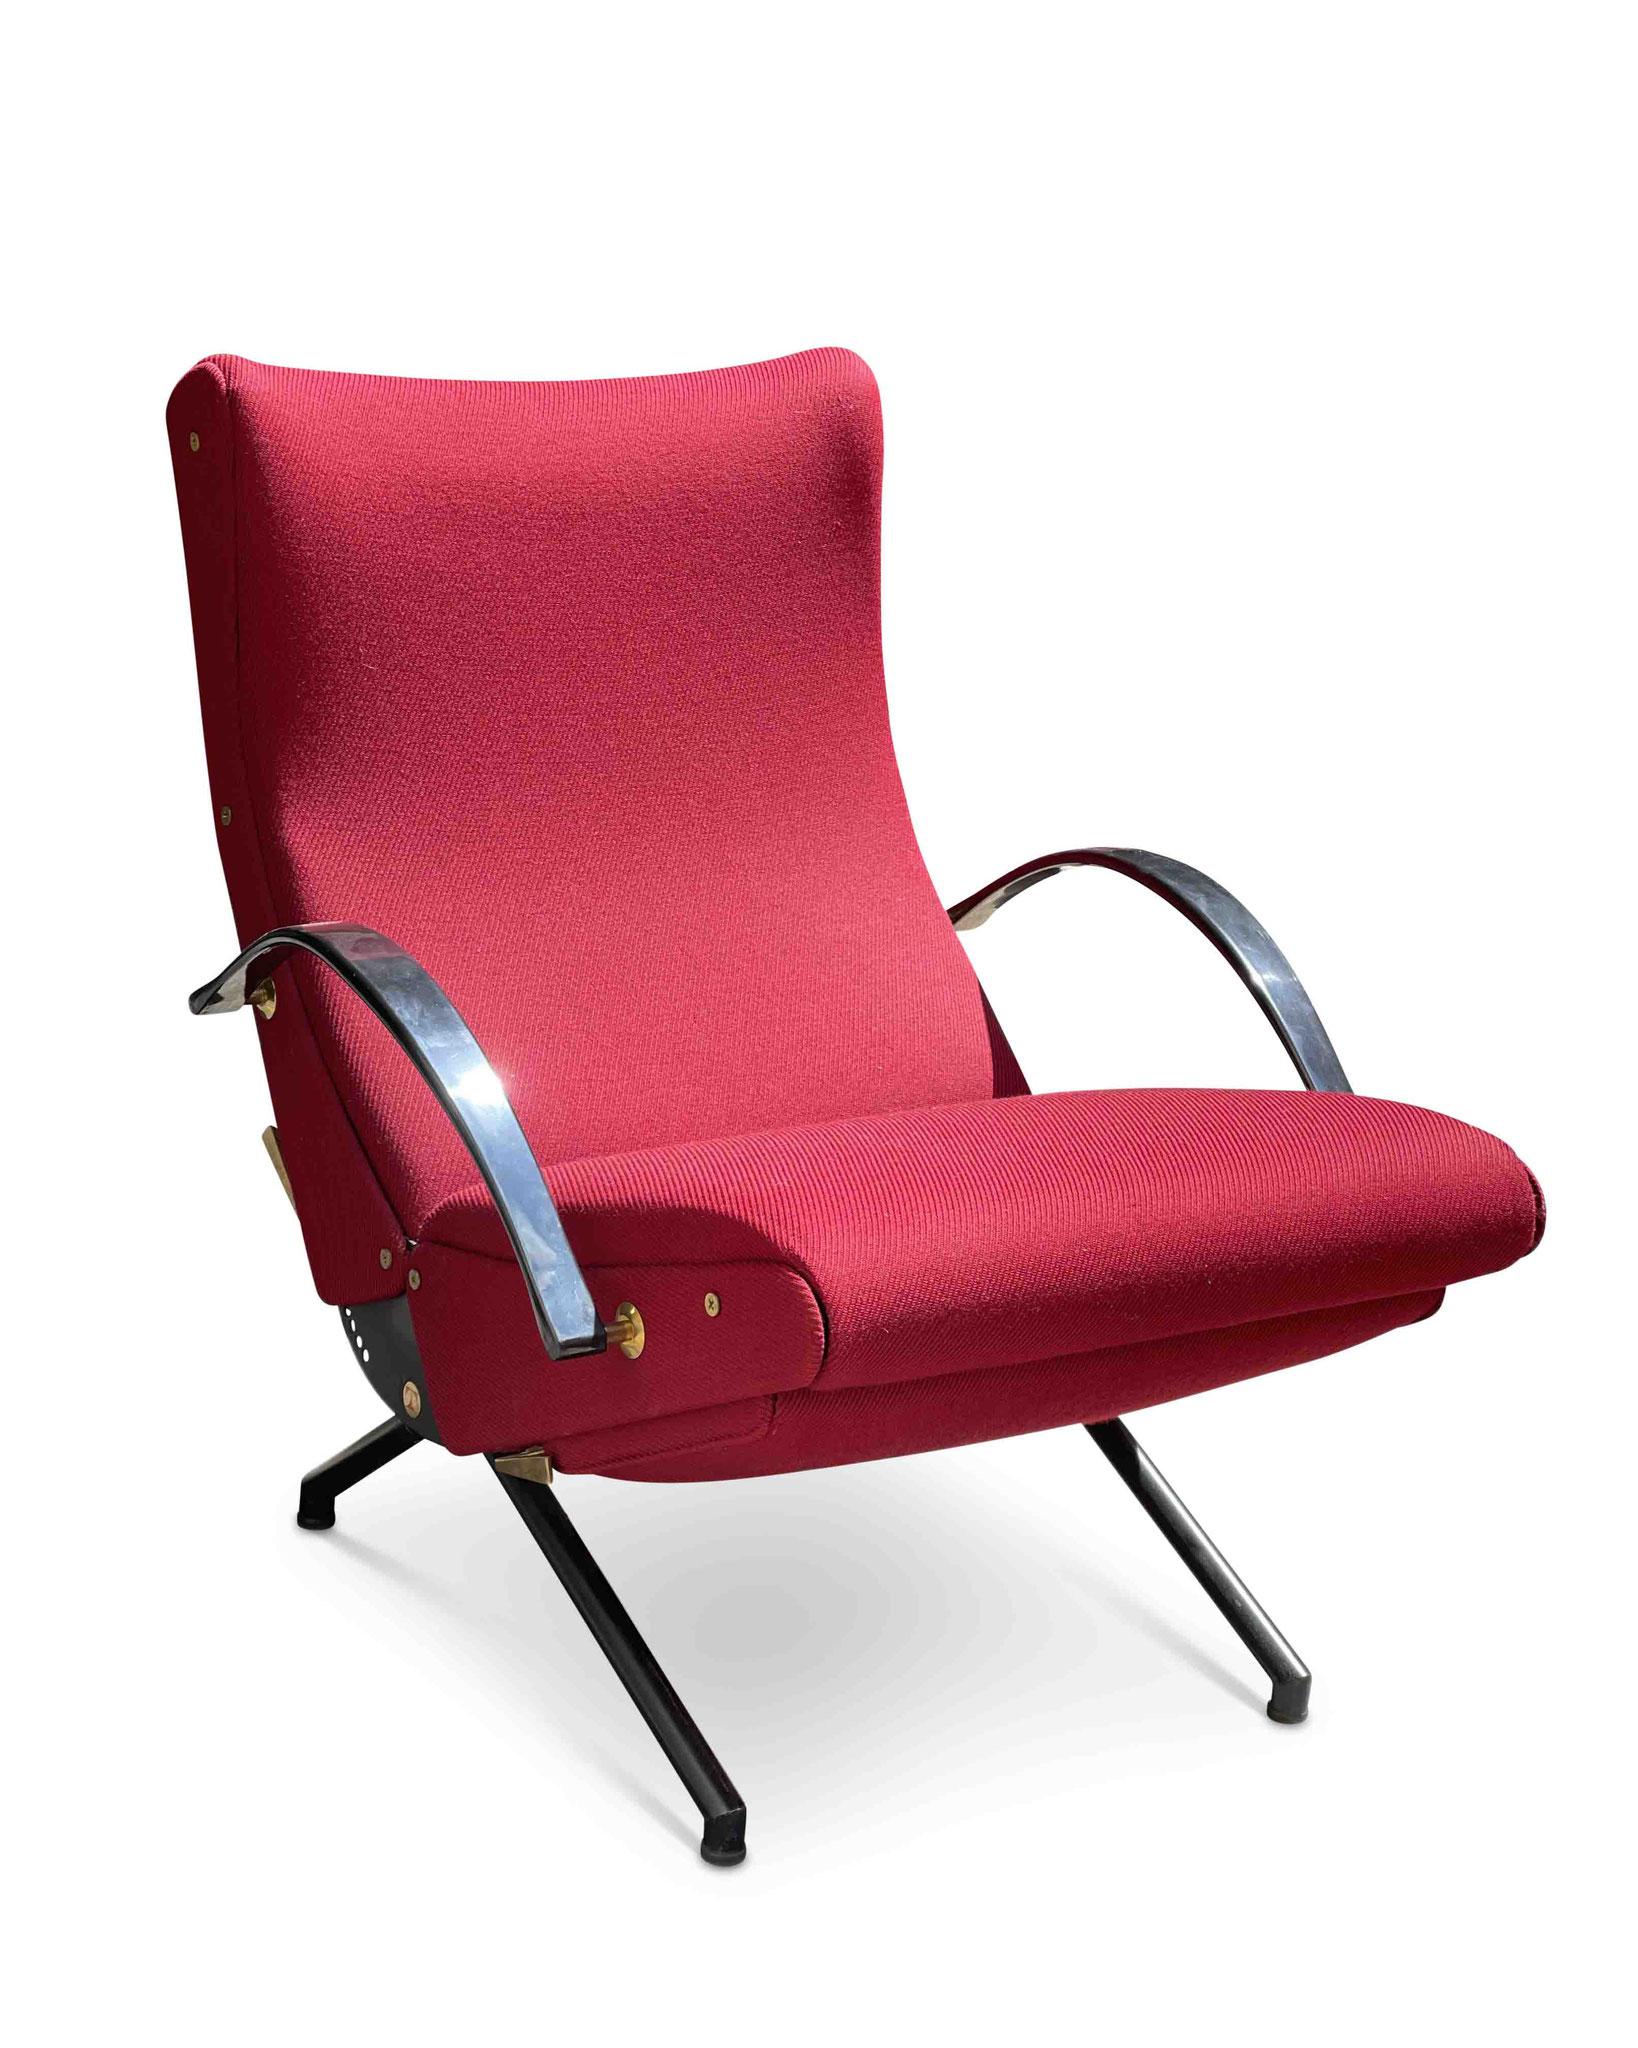 P40 Osvaldo Borsani Tecno chairs